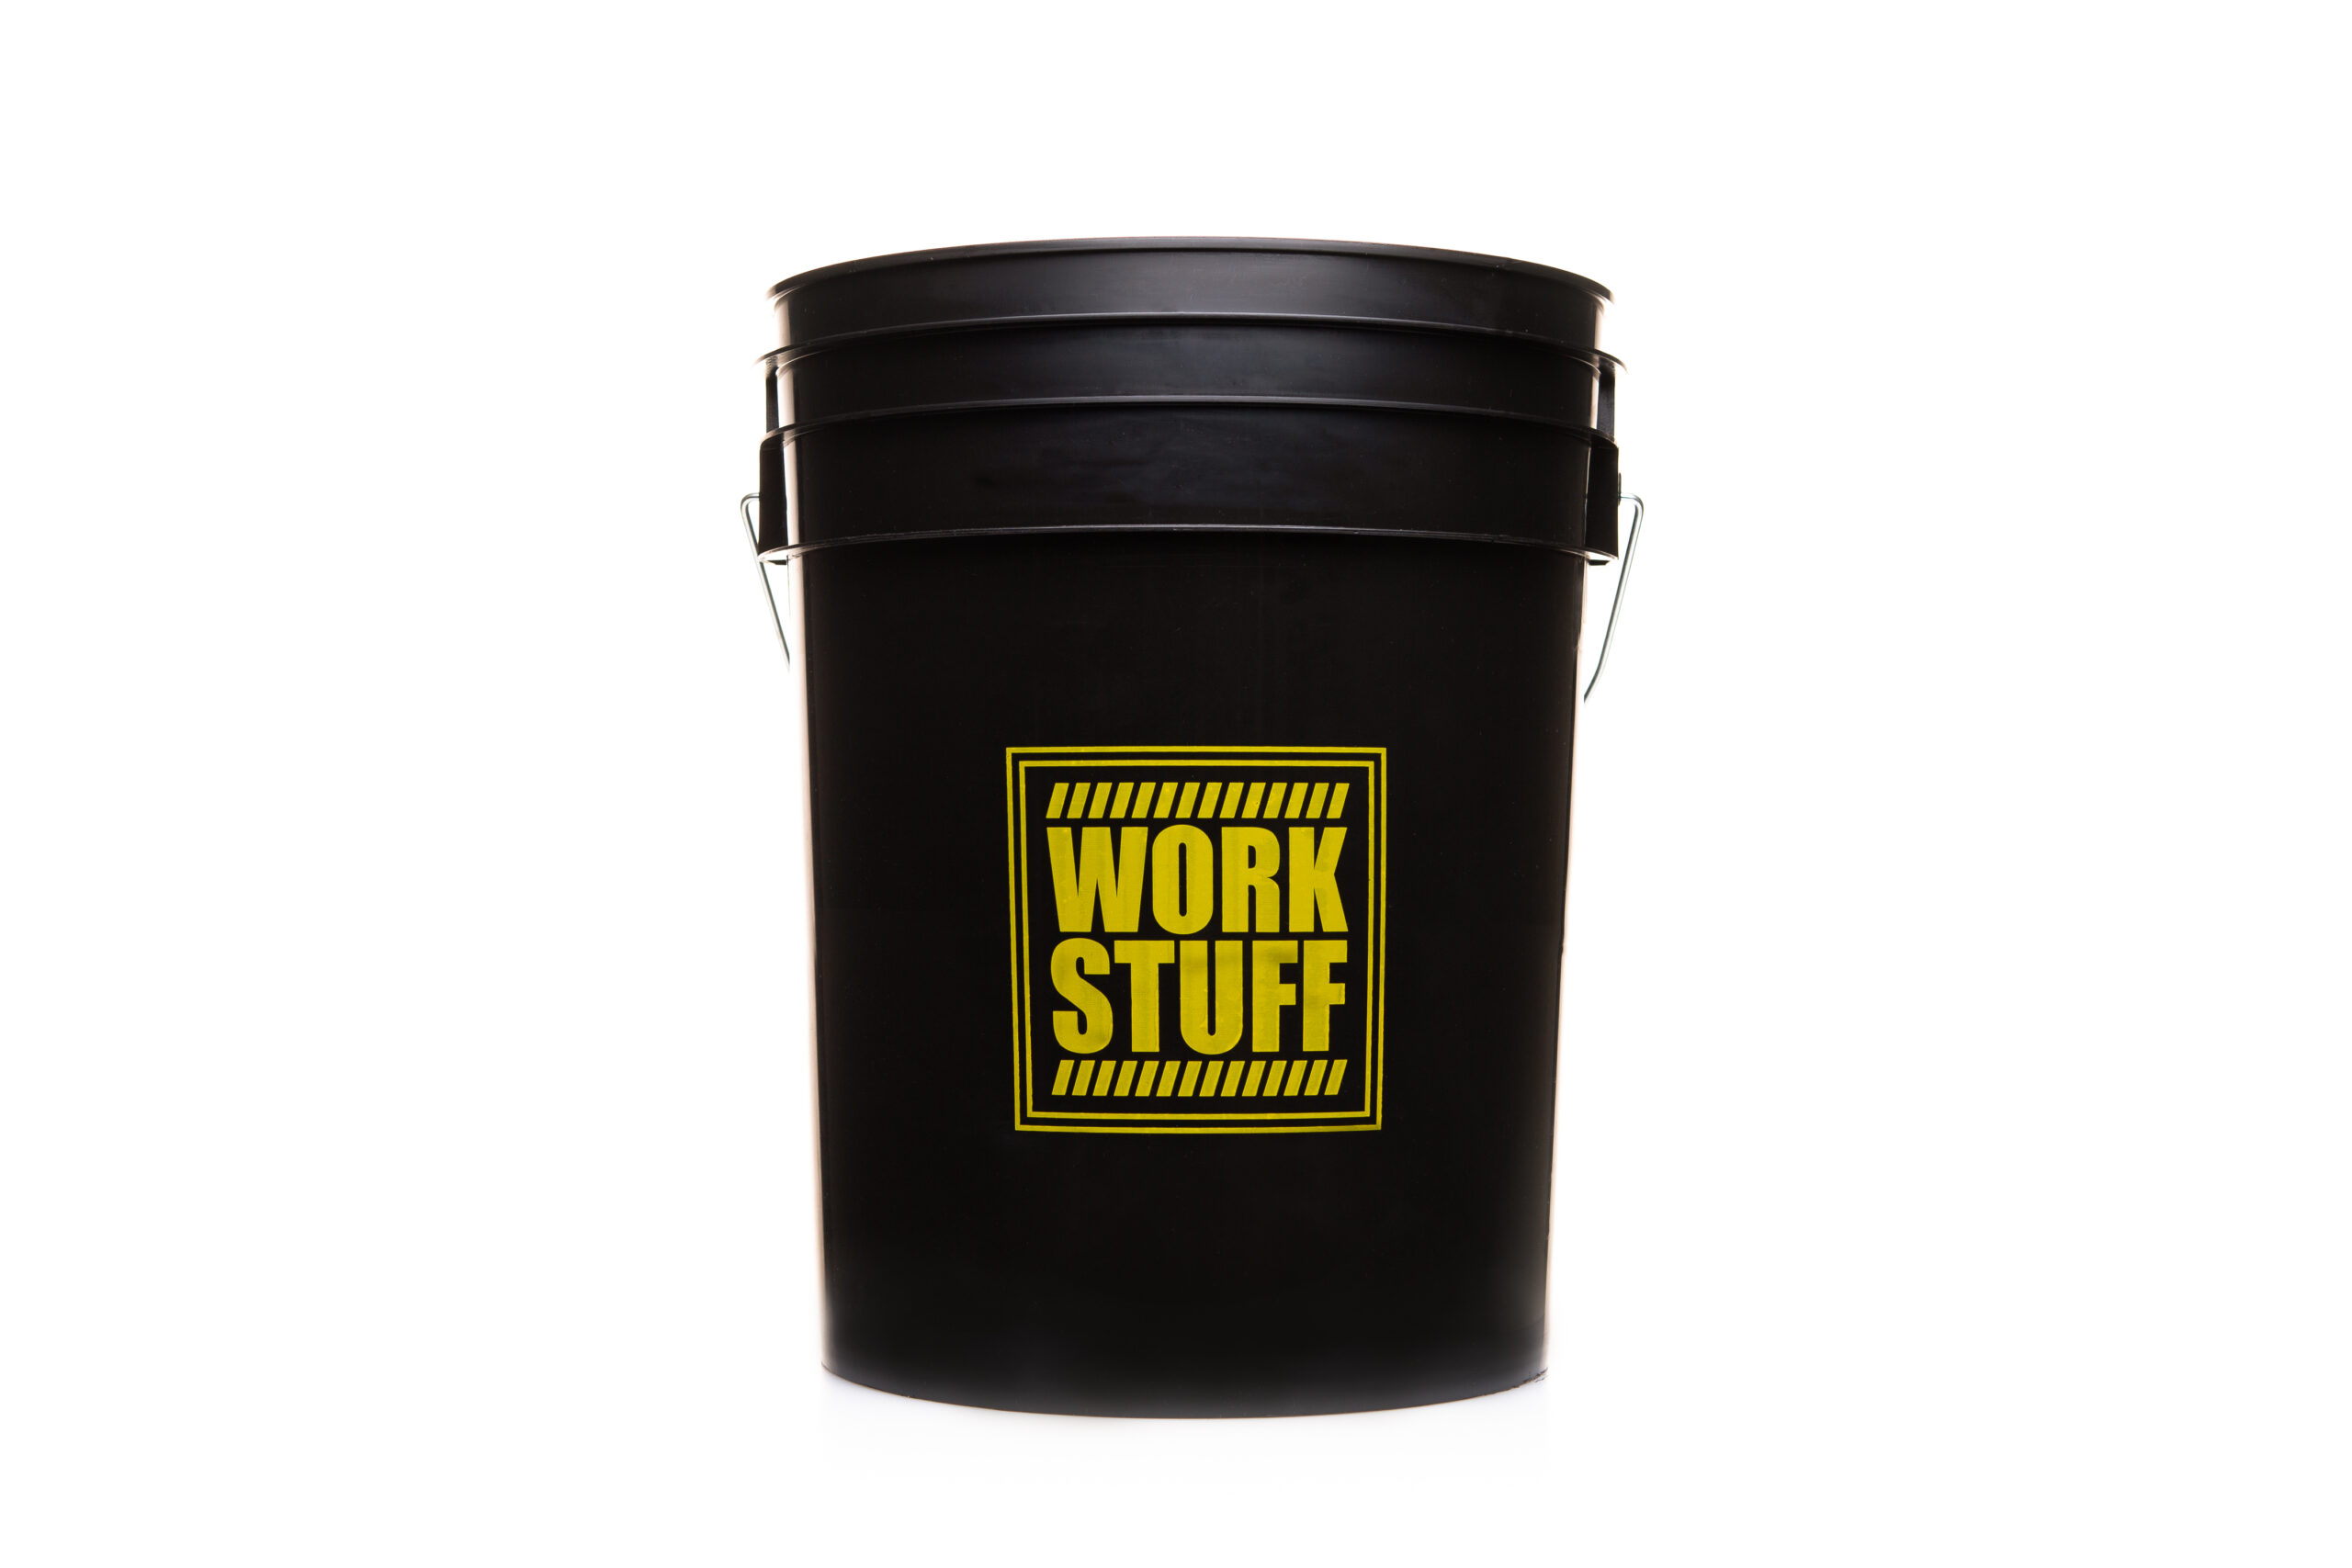 Work Stuff Detailing bucket RINSE 2